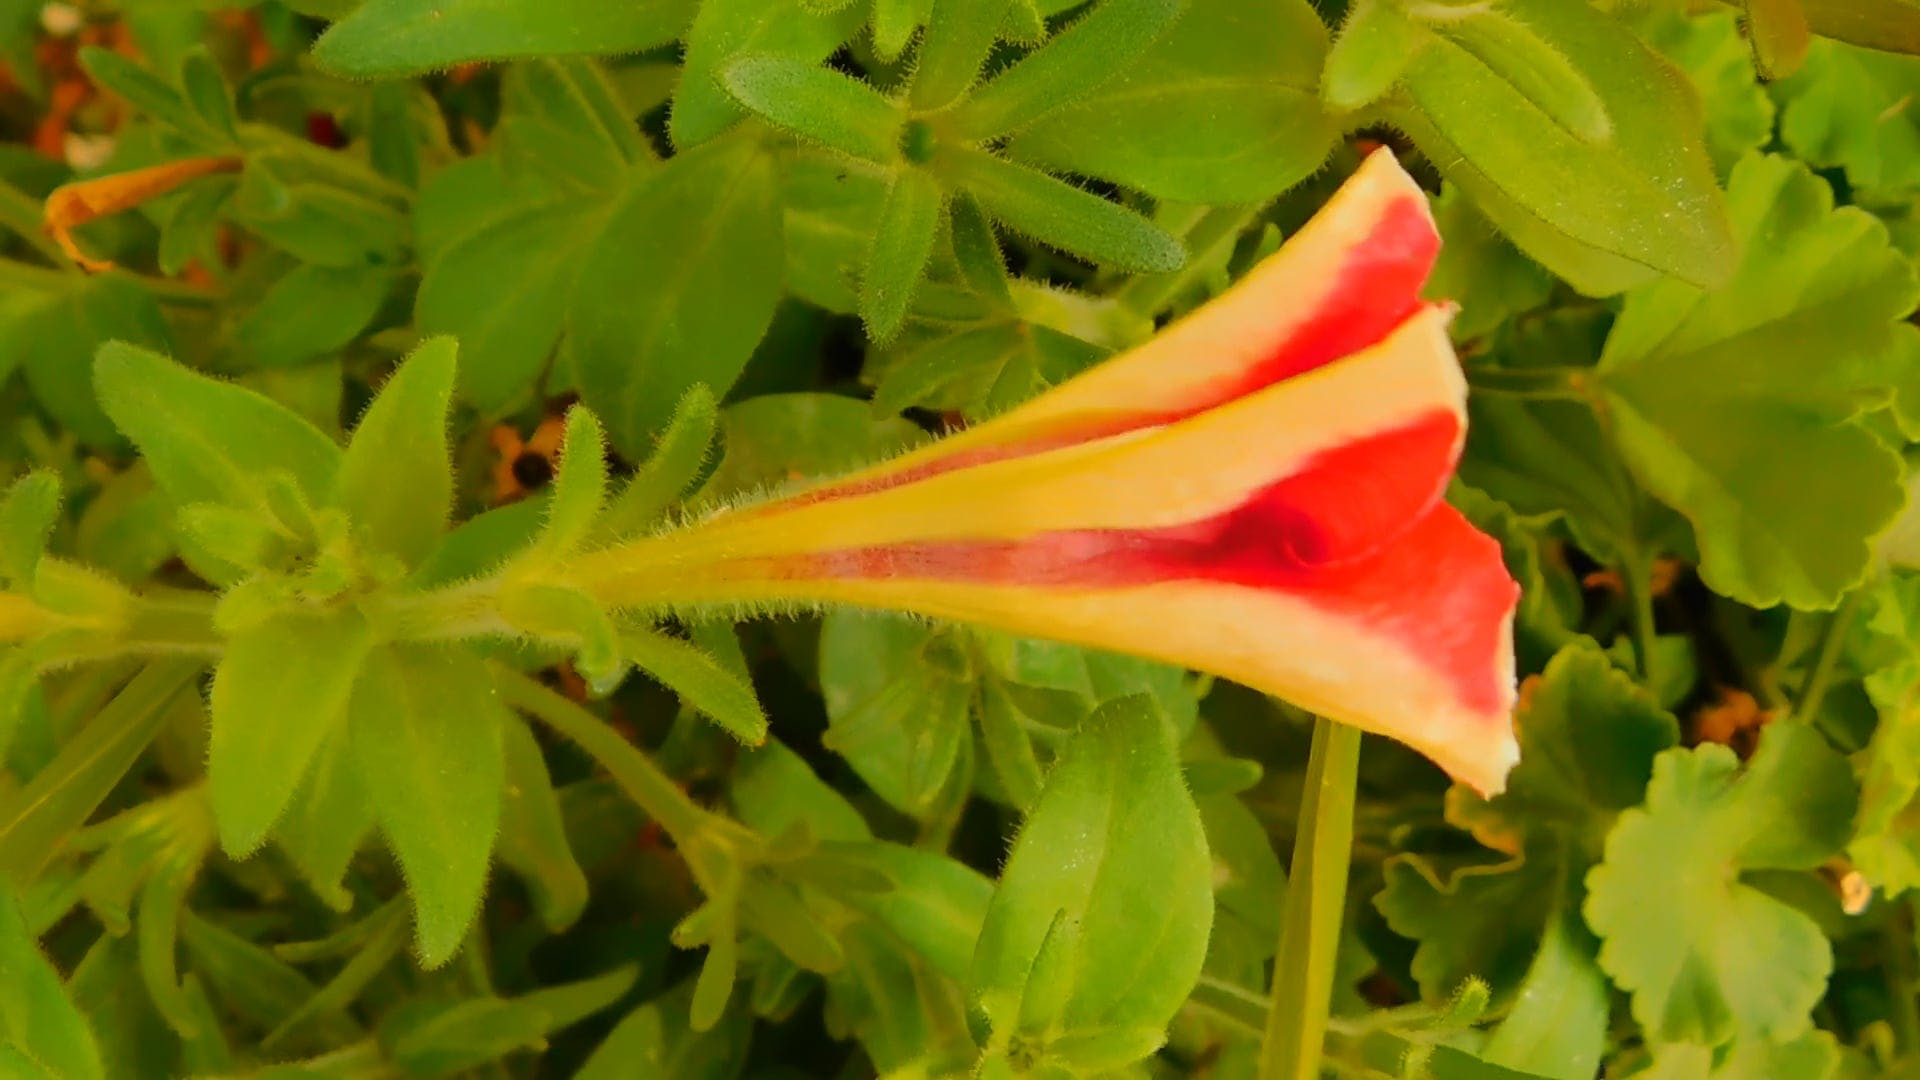 Flower Bud Shaking In The Wind